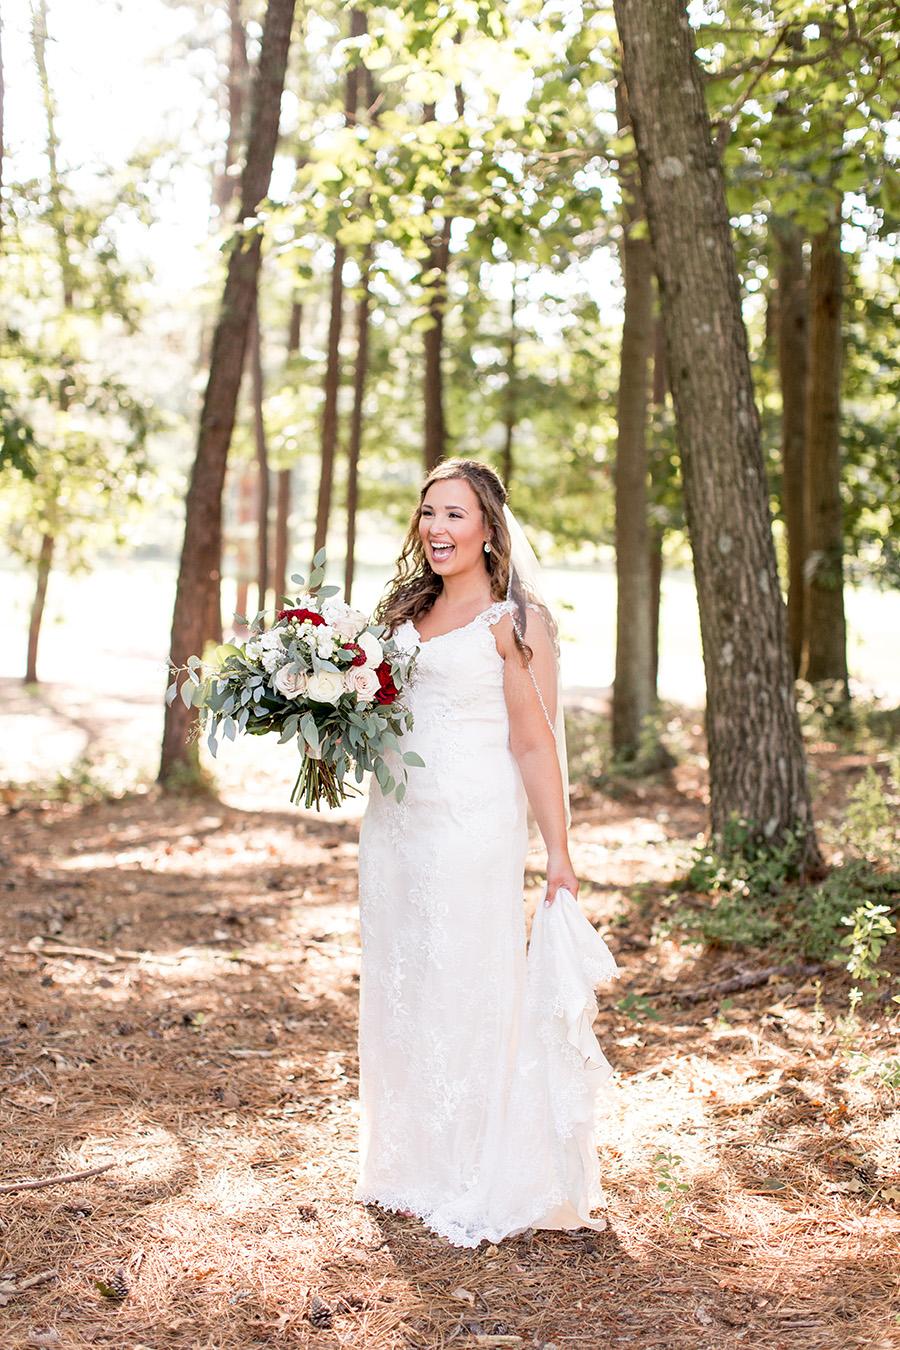 bridal wedding day portraits at running deer golf